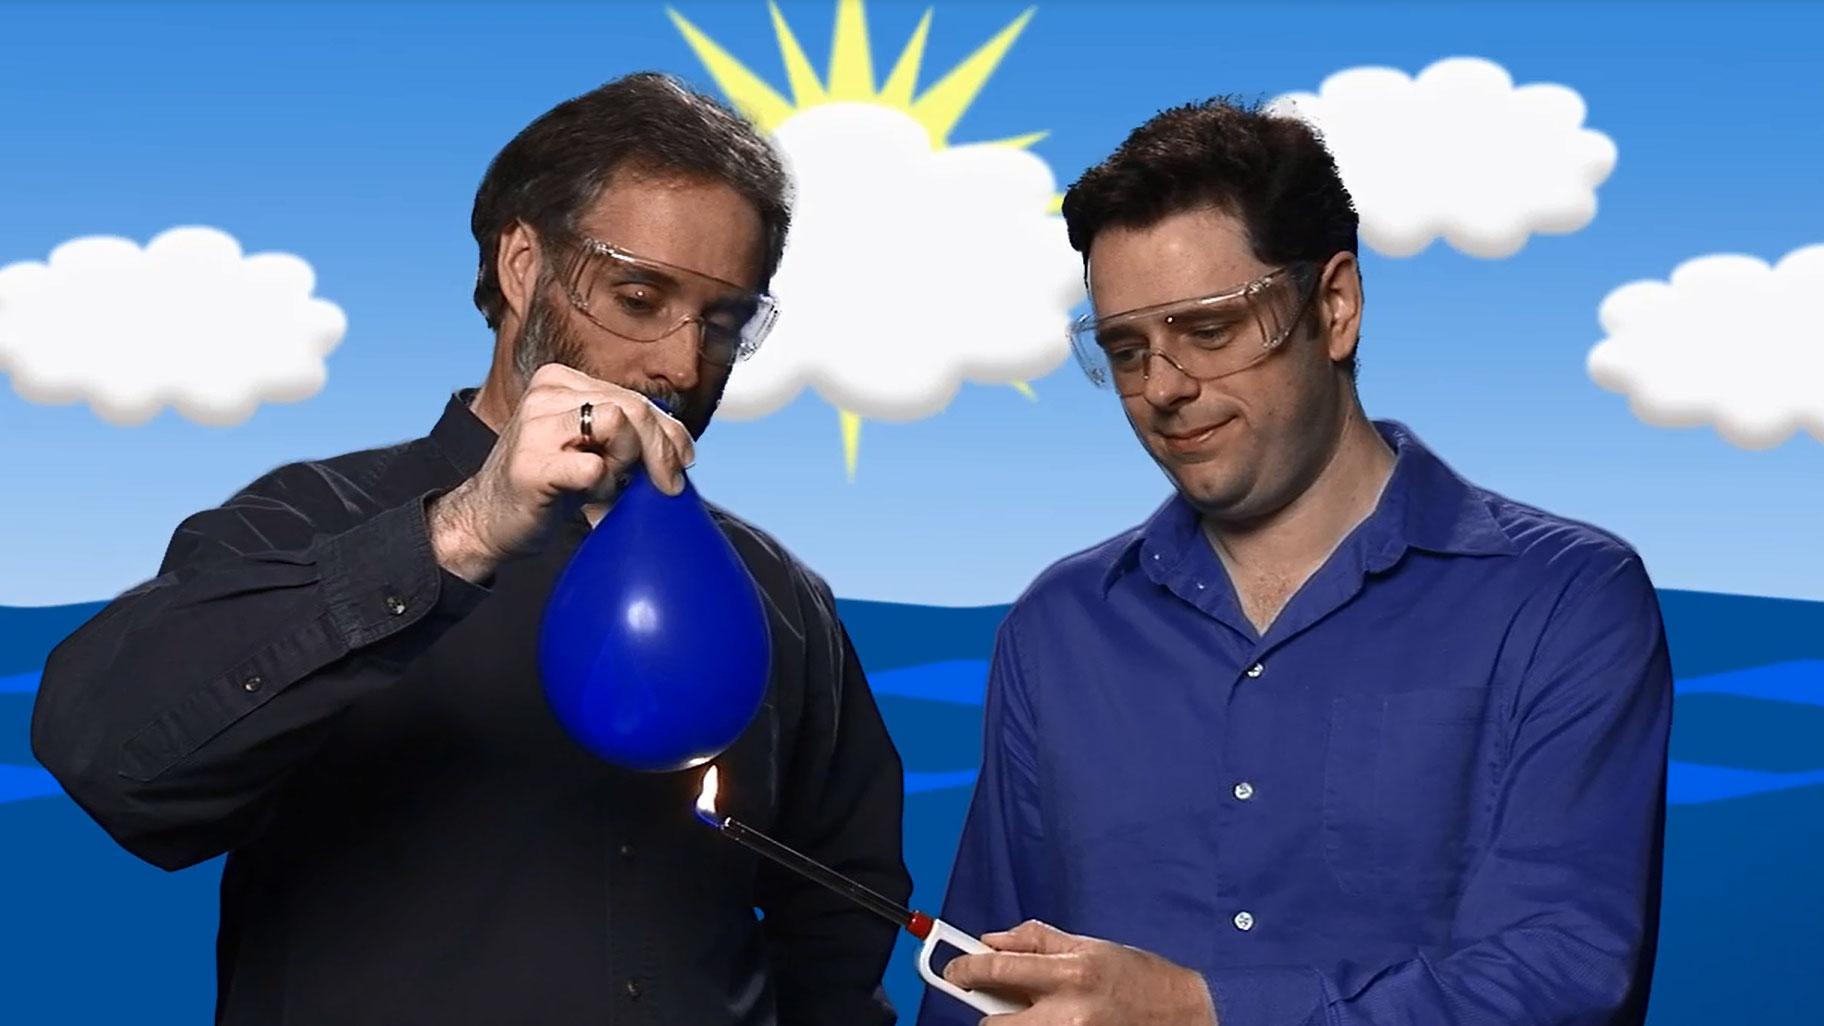 Water Balloon Demonstration Video Tutorial